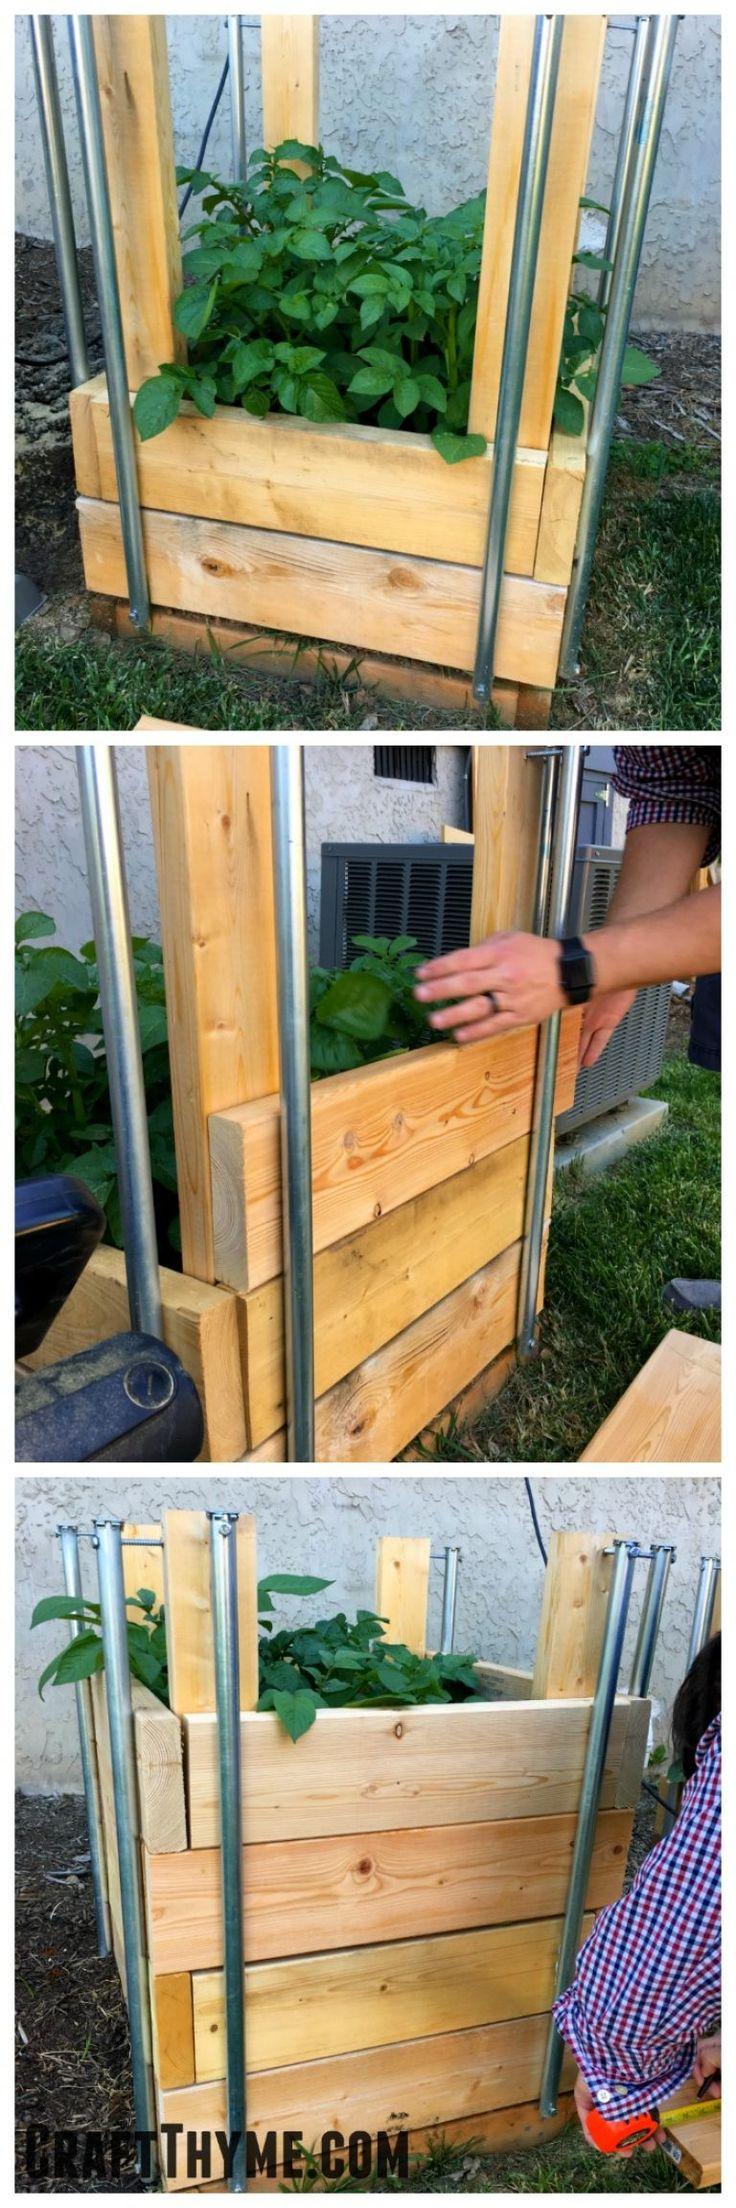 Best 25 Box garden ideas only on Pinterest Raised gardens